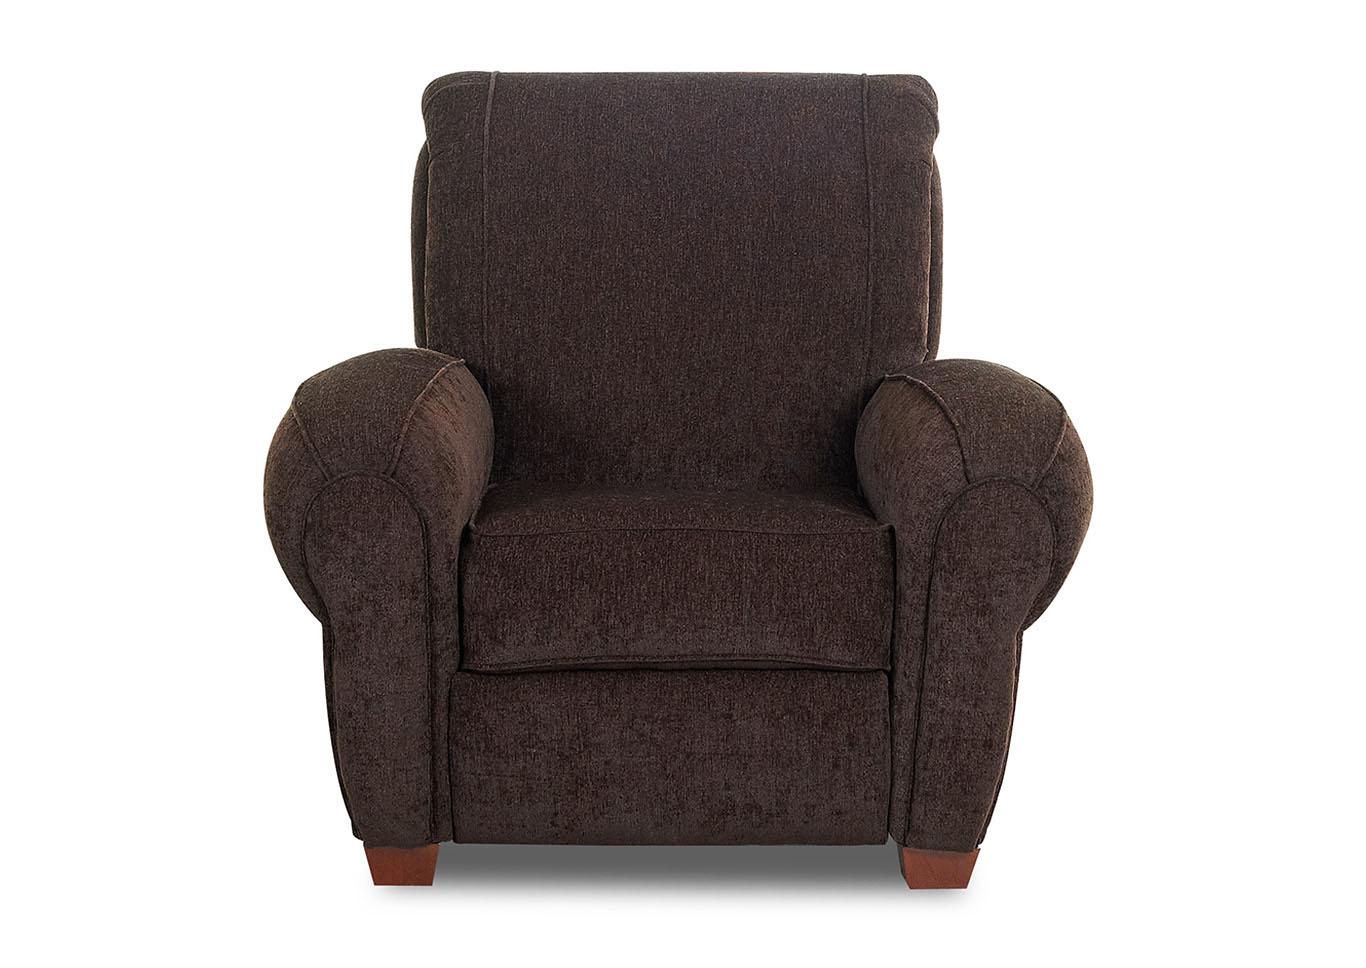 Miraculous Best Buy Furniture And Mattress Cigar Reclining Fabric Chair Download Free Architecture Designs Estepponolmadebymaigaardcom